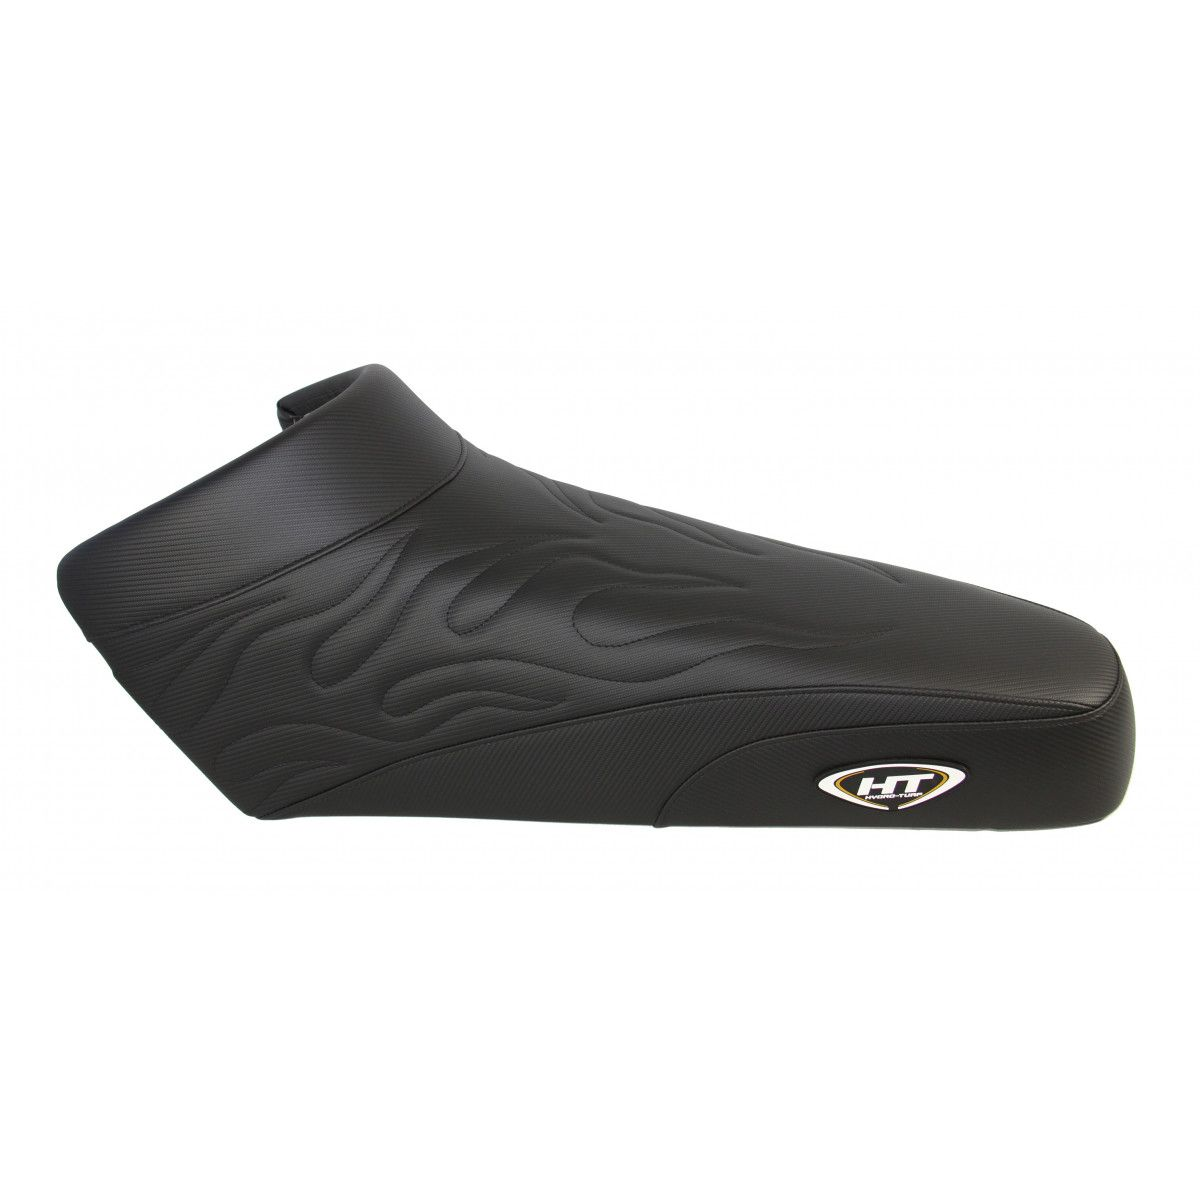 AZ-SEW74 Solid black Hydro-turf Premier Seat Cover For Yamaha WaveBlaster 1